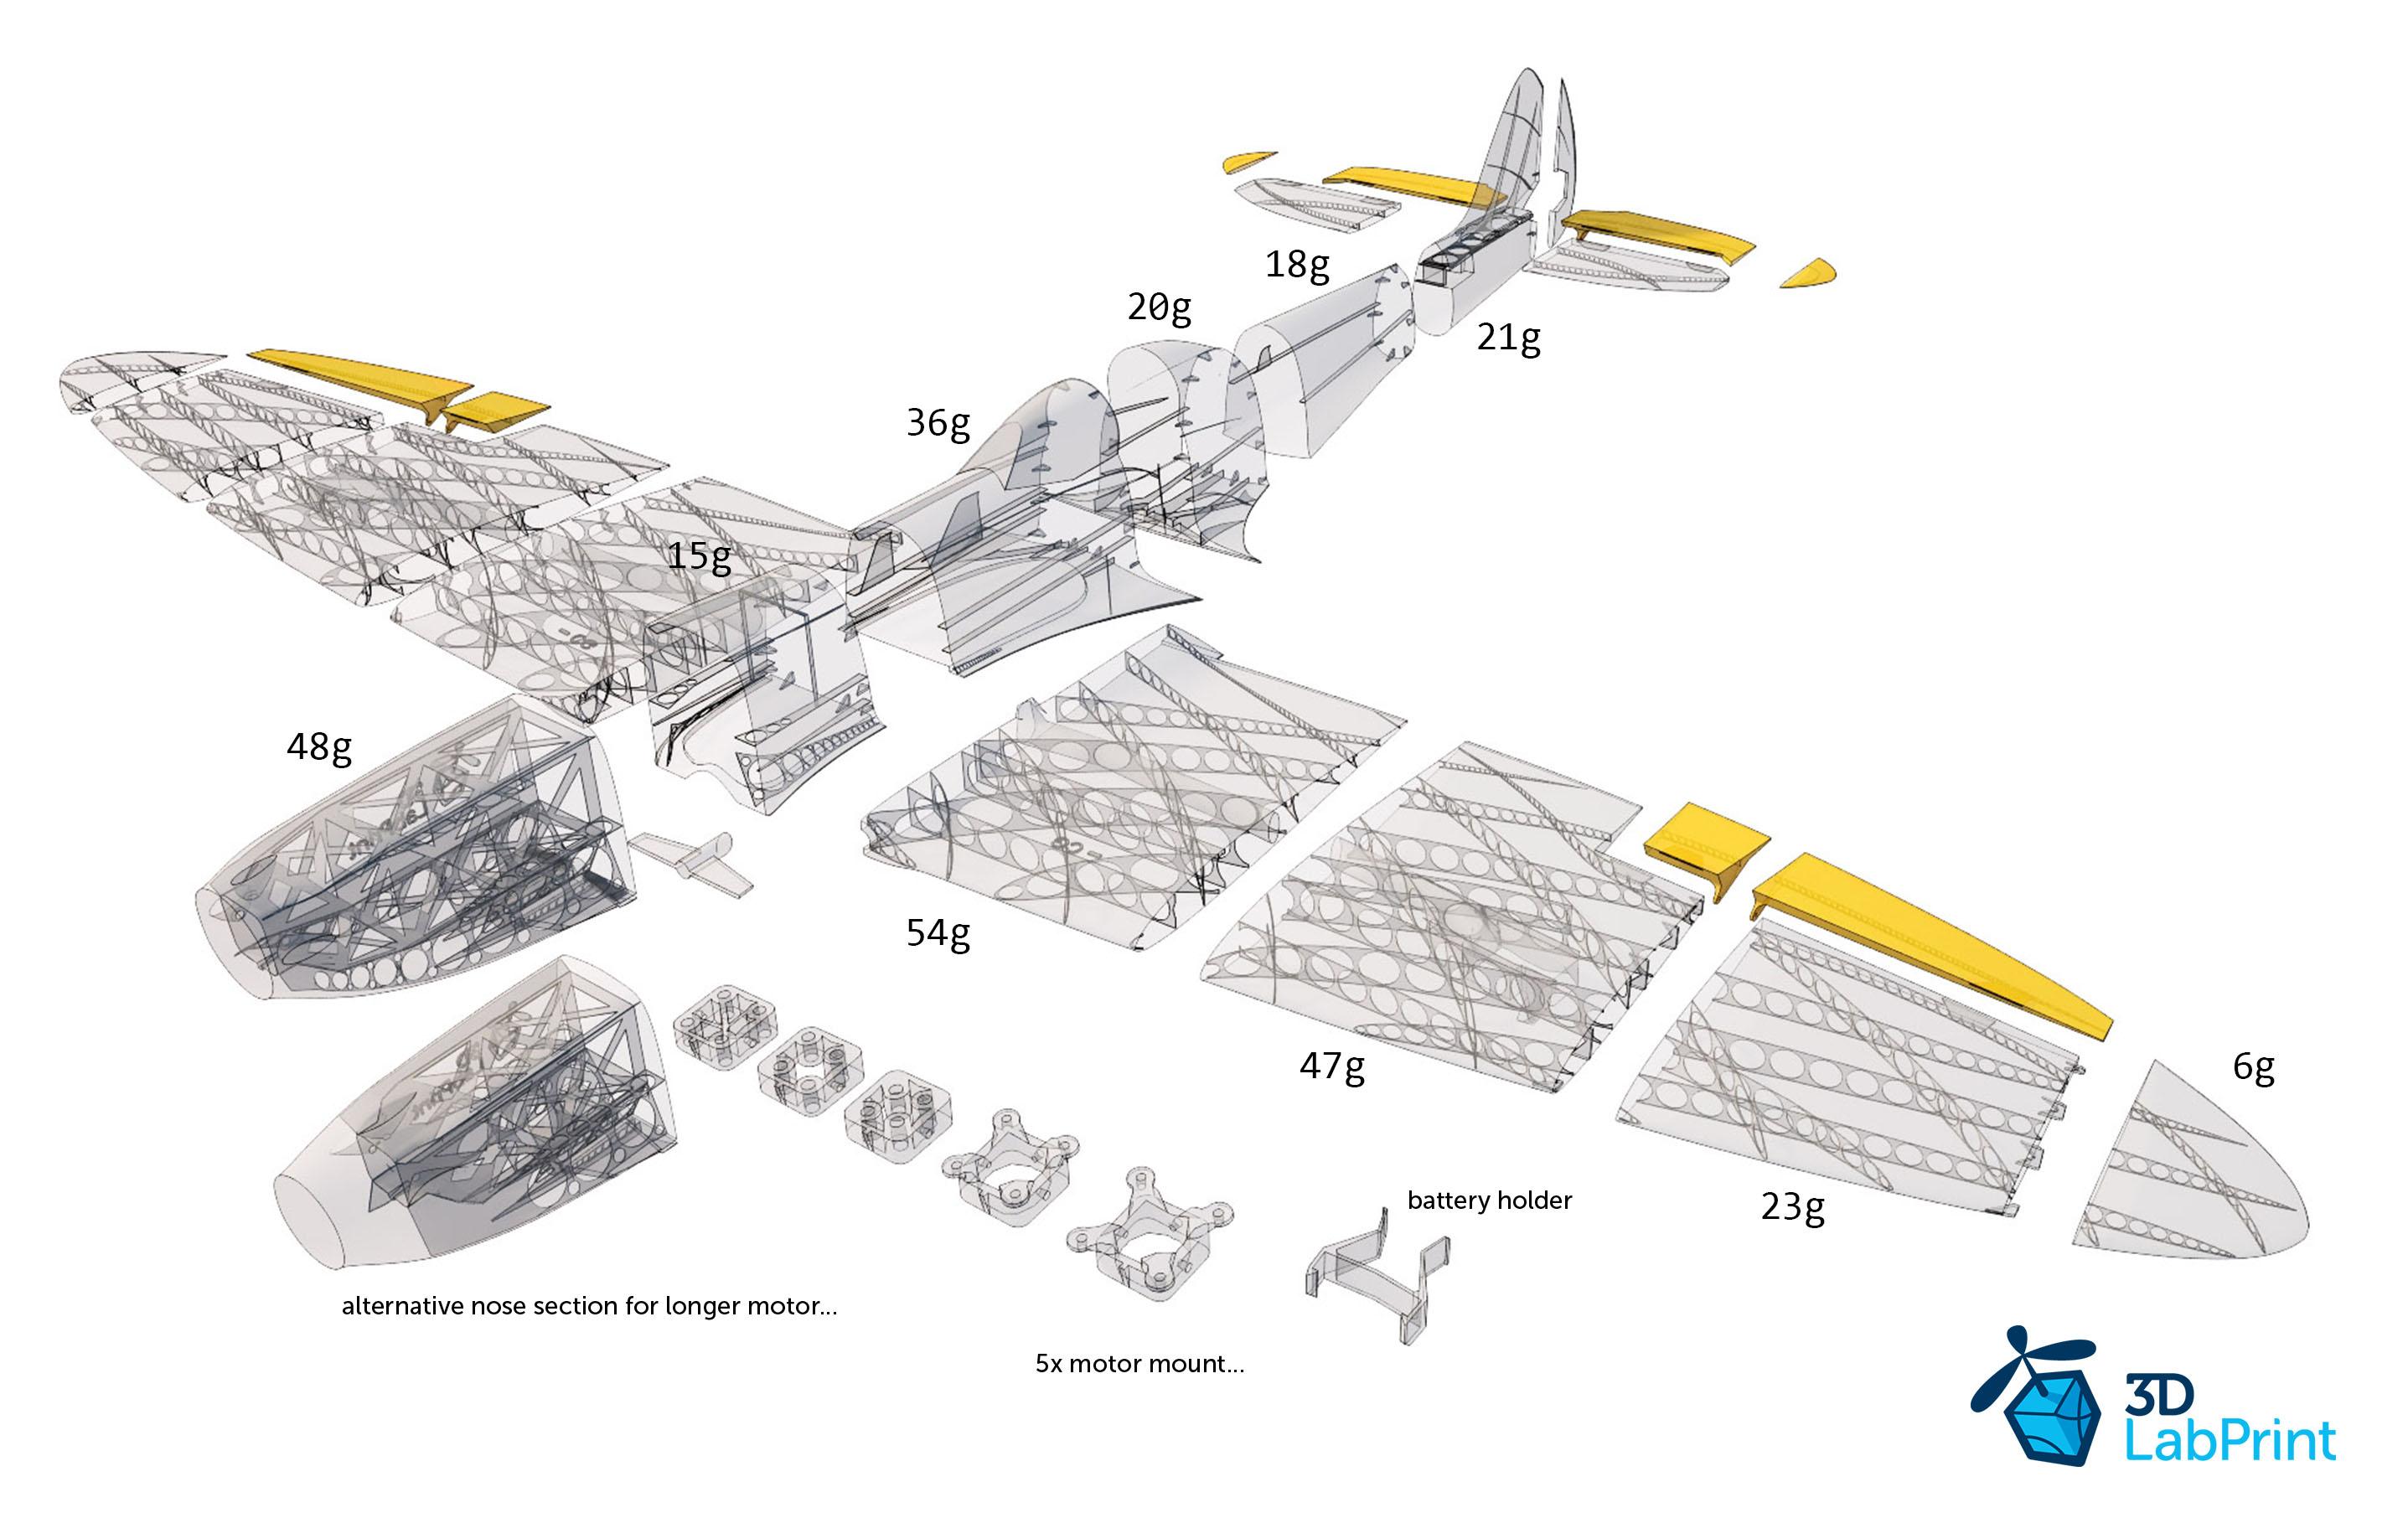 Spitfire Mk Xvi 3dlabprint